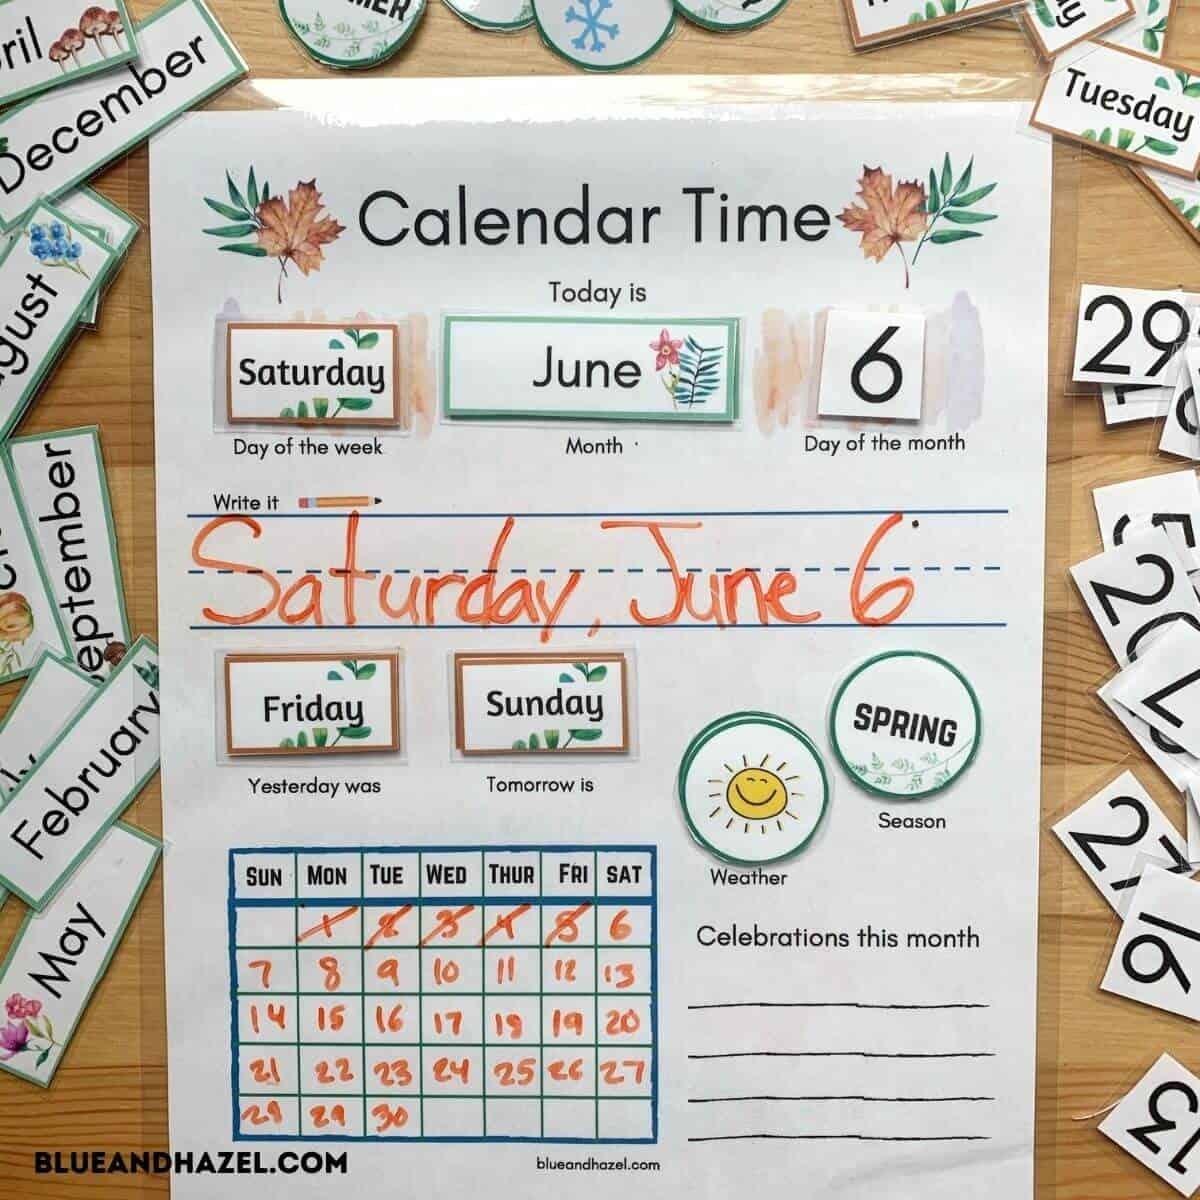 Calendar Time Printable